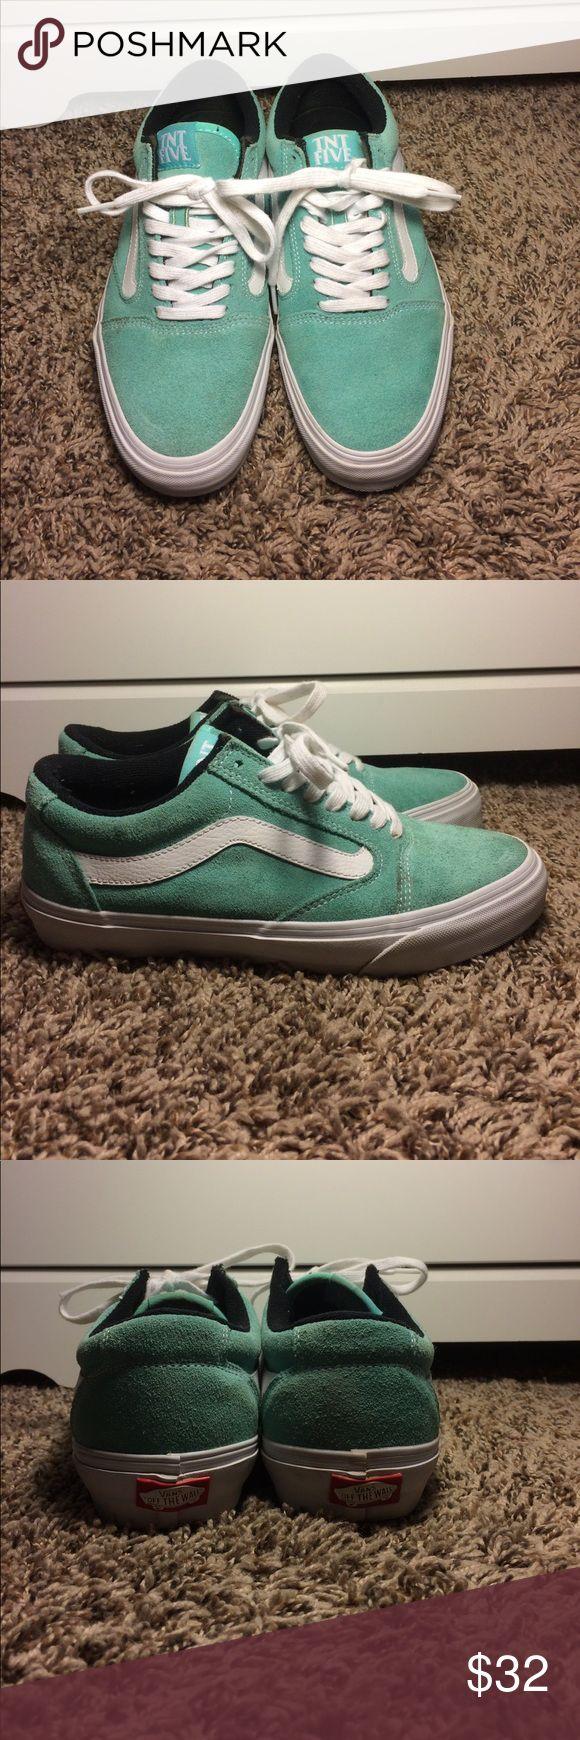 Vans TNT Tony Trujillo skate shoes Mint green vans men's size 6.5 great condition a few spots see pictures Vans Shoes Sneakers